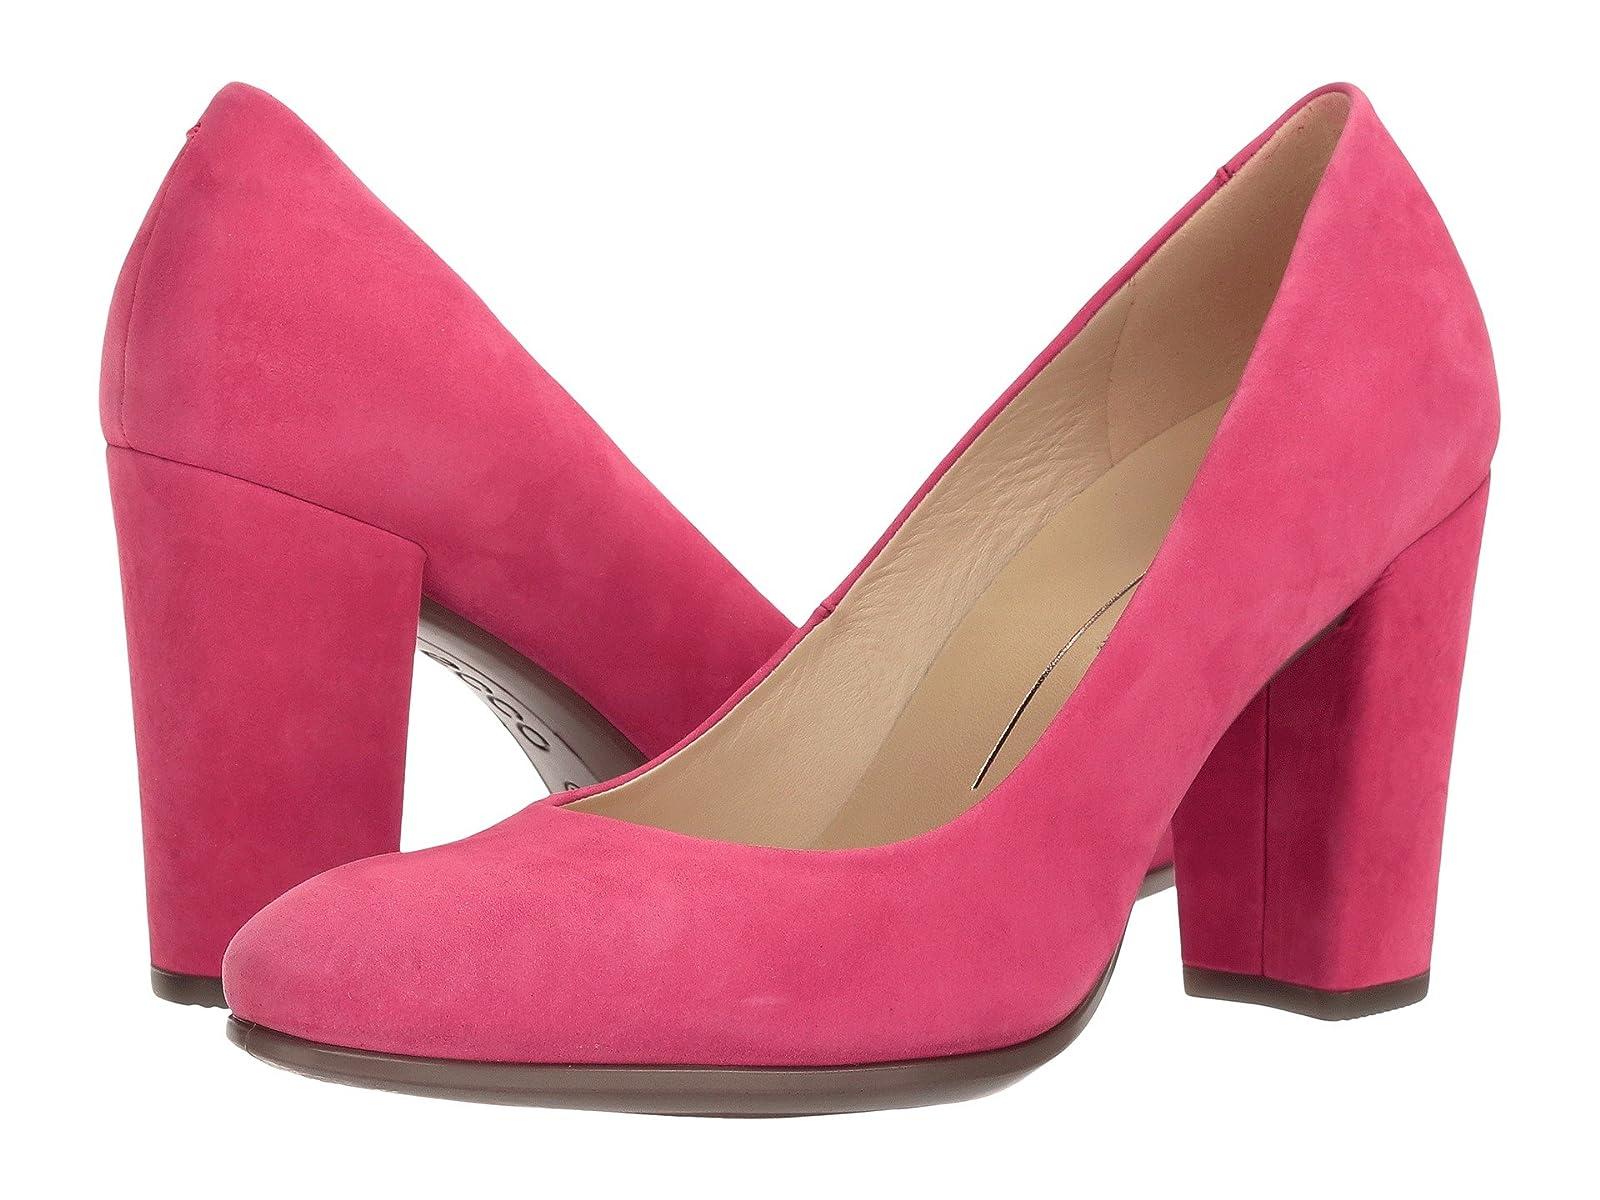 ECCO Shape 75 Block PumpCheap and distinctive eye-catching shoes